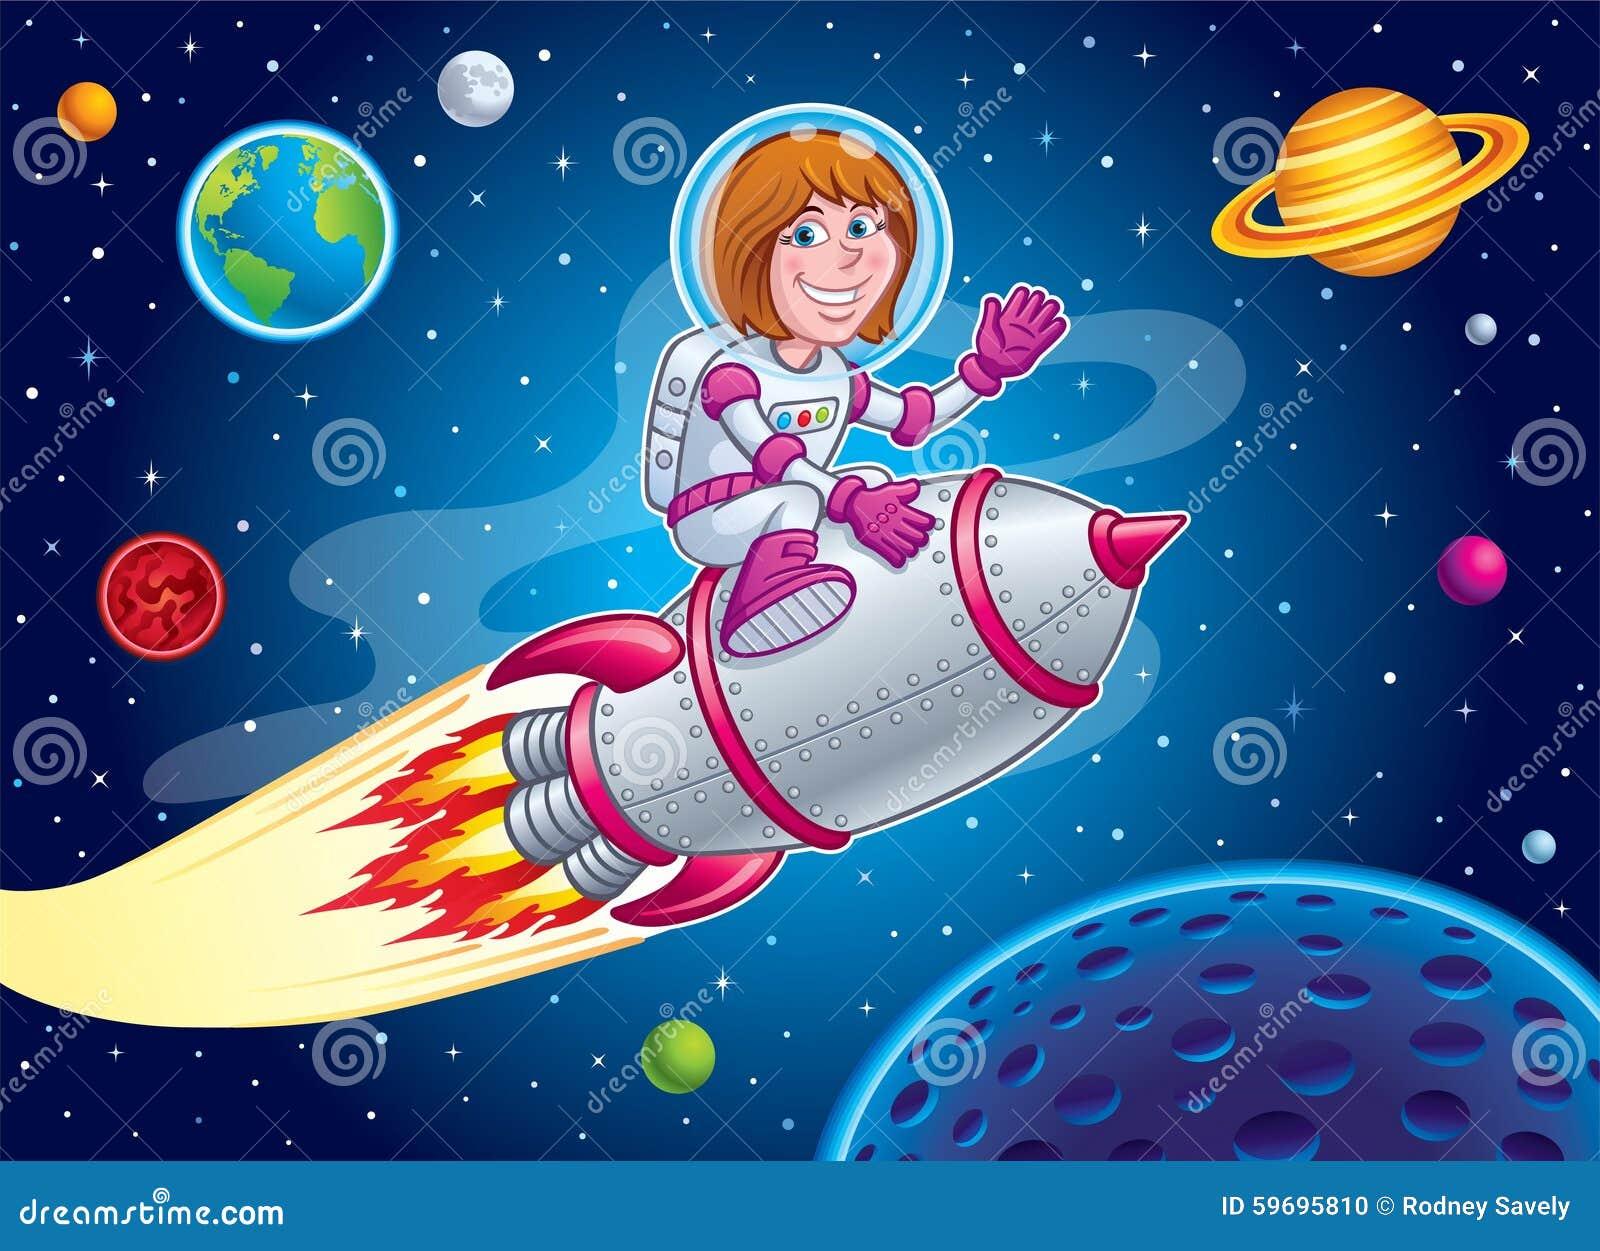 Final, space women can